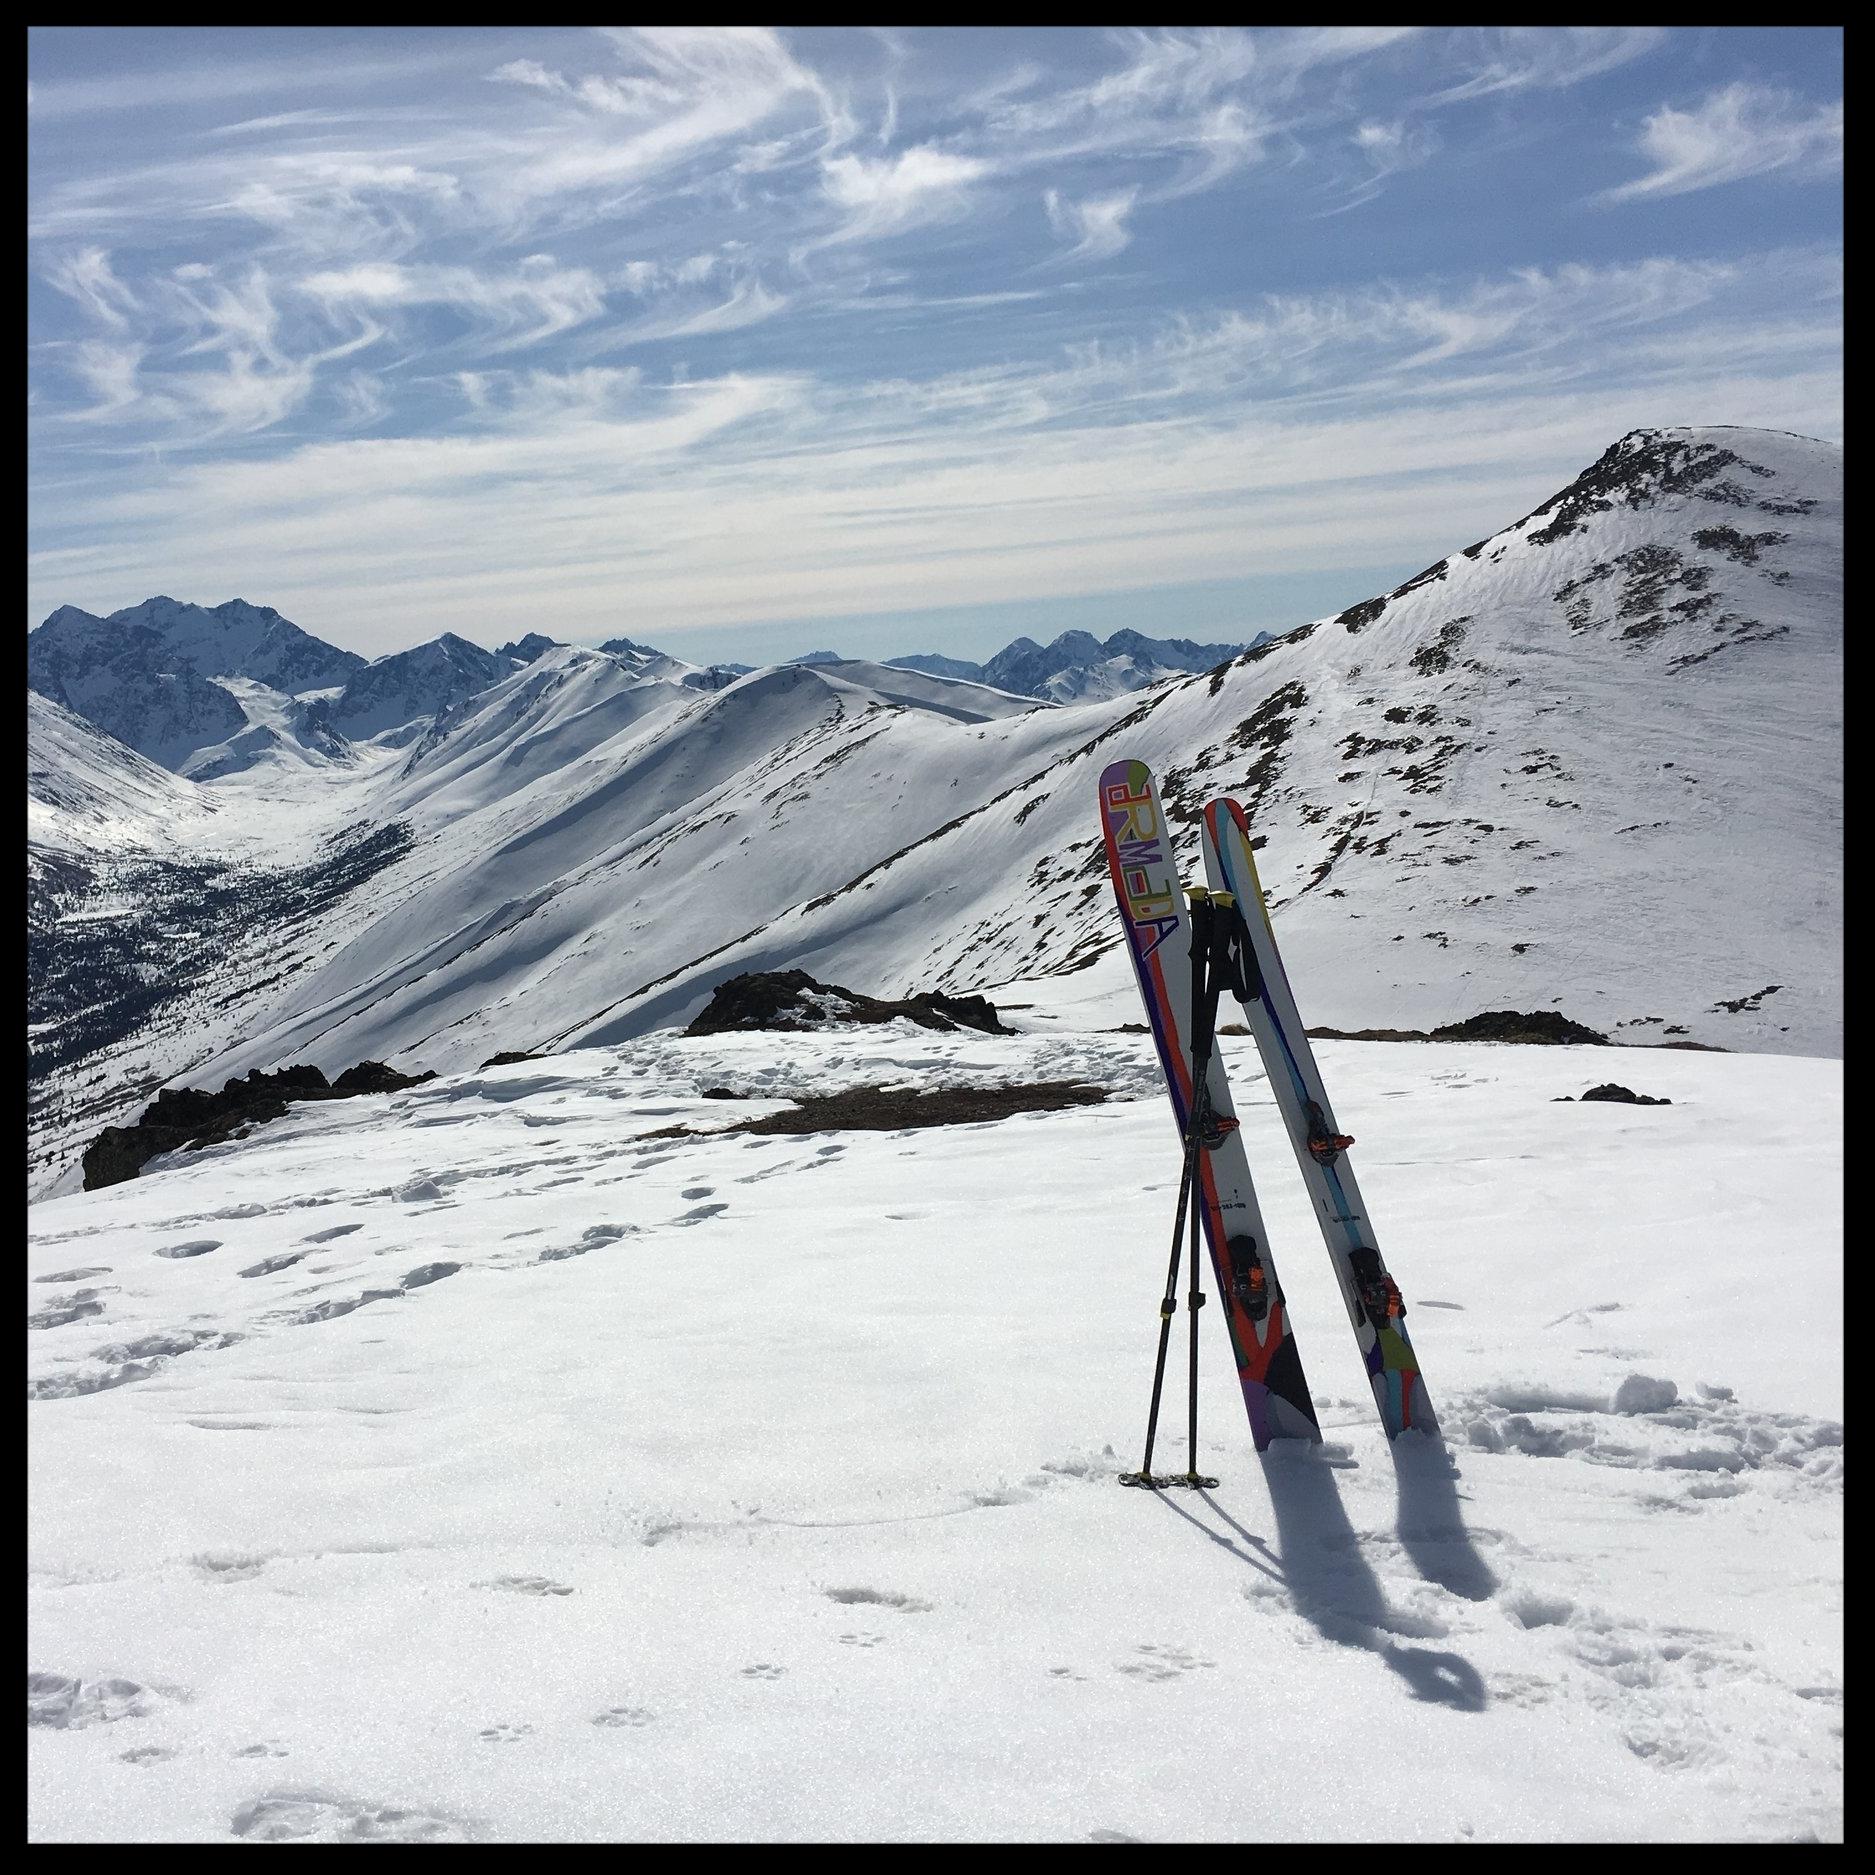 Dechipering Ski Specs: Picking a set of Skis